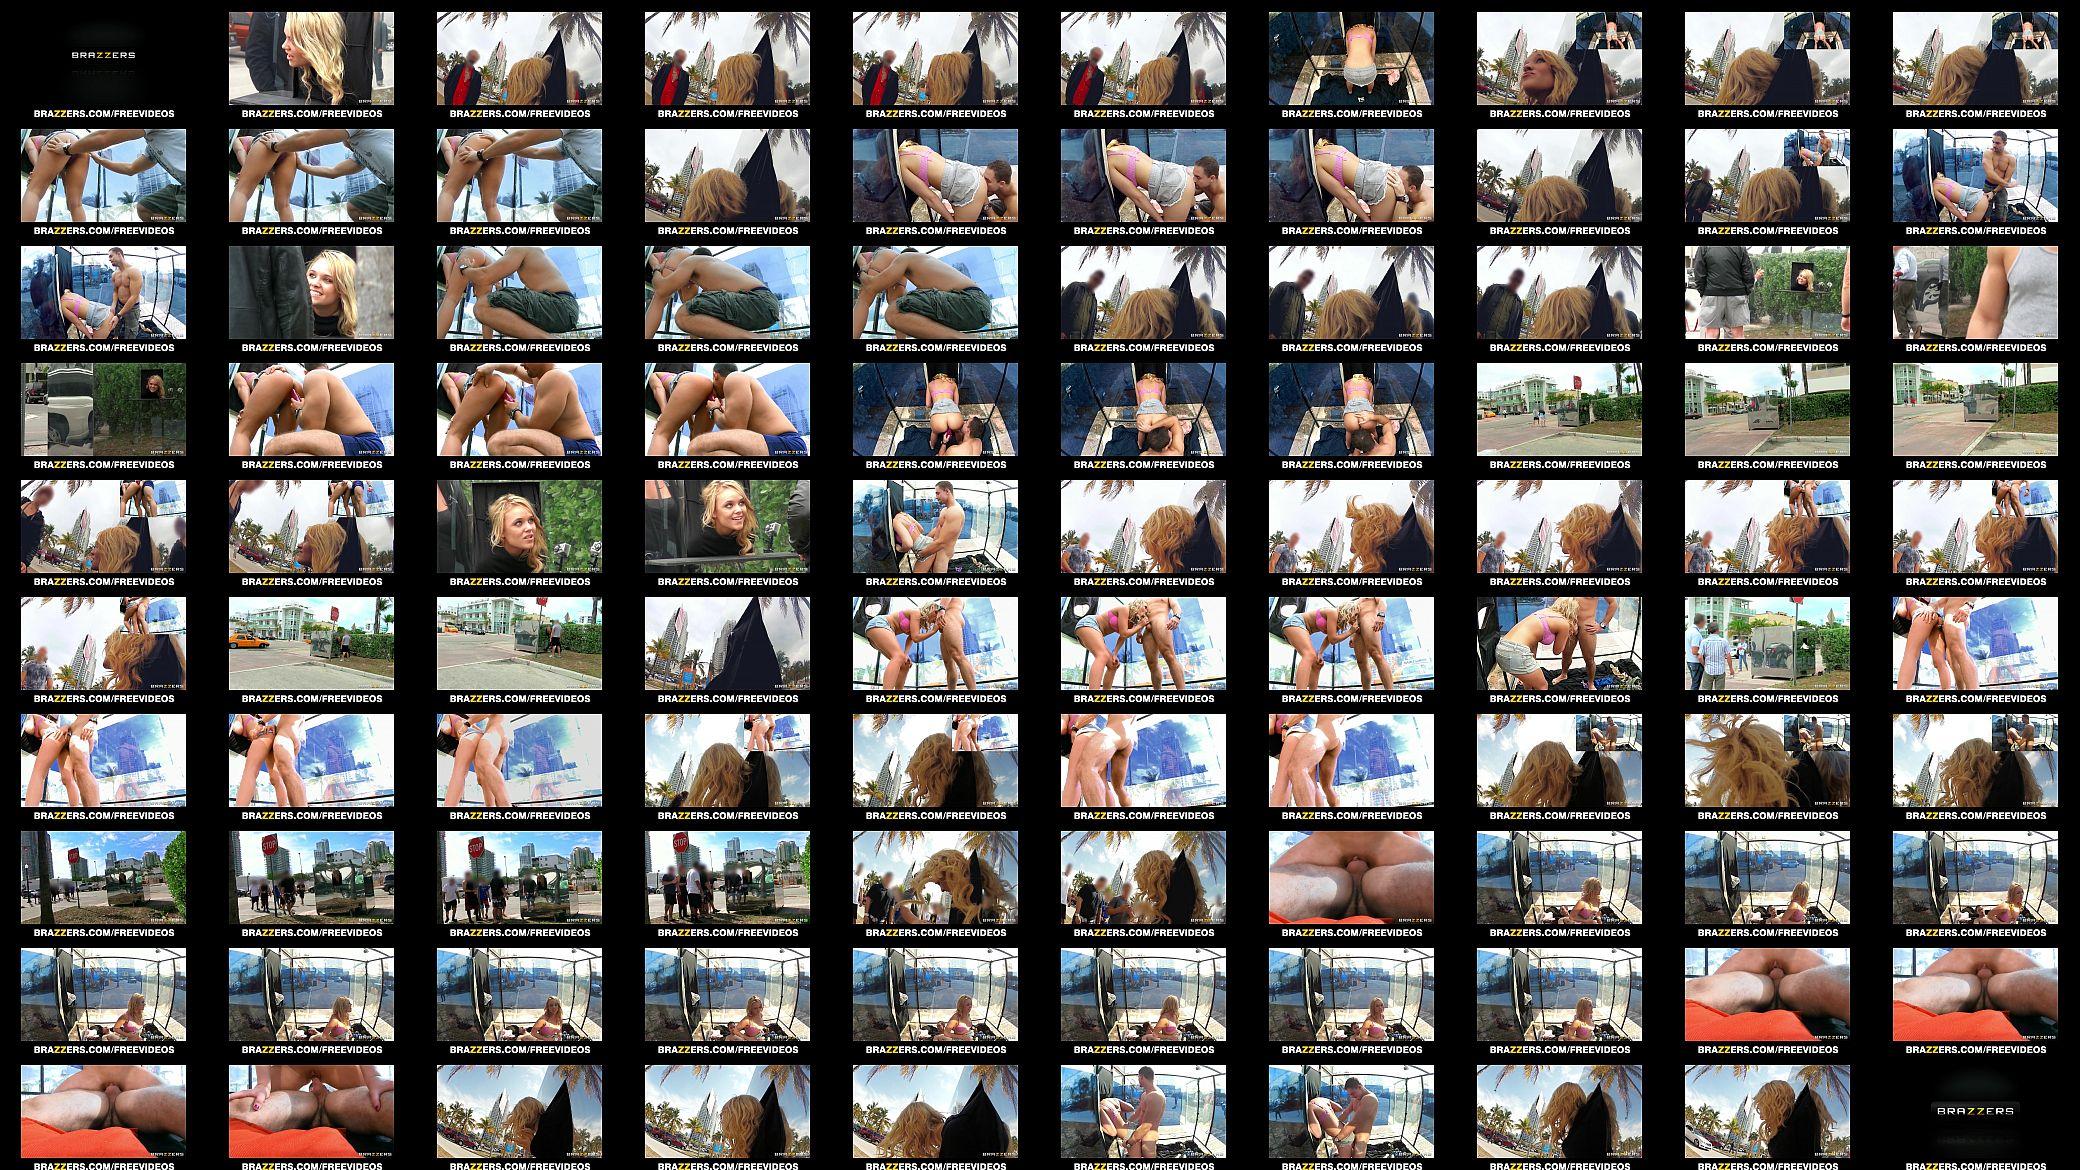 selena gomez photo nude